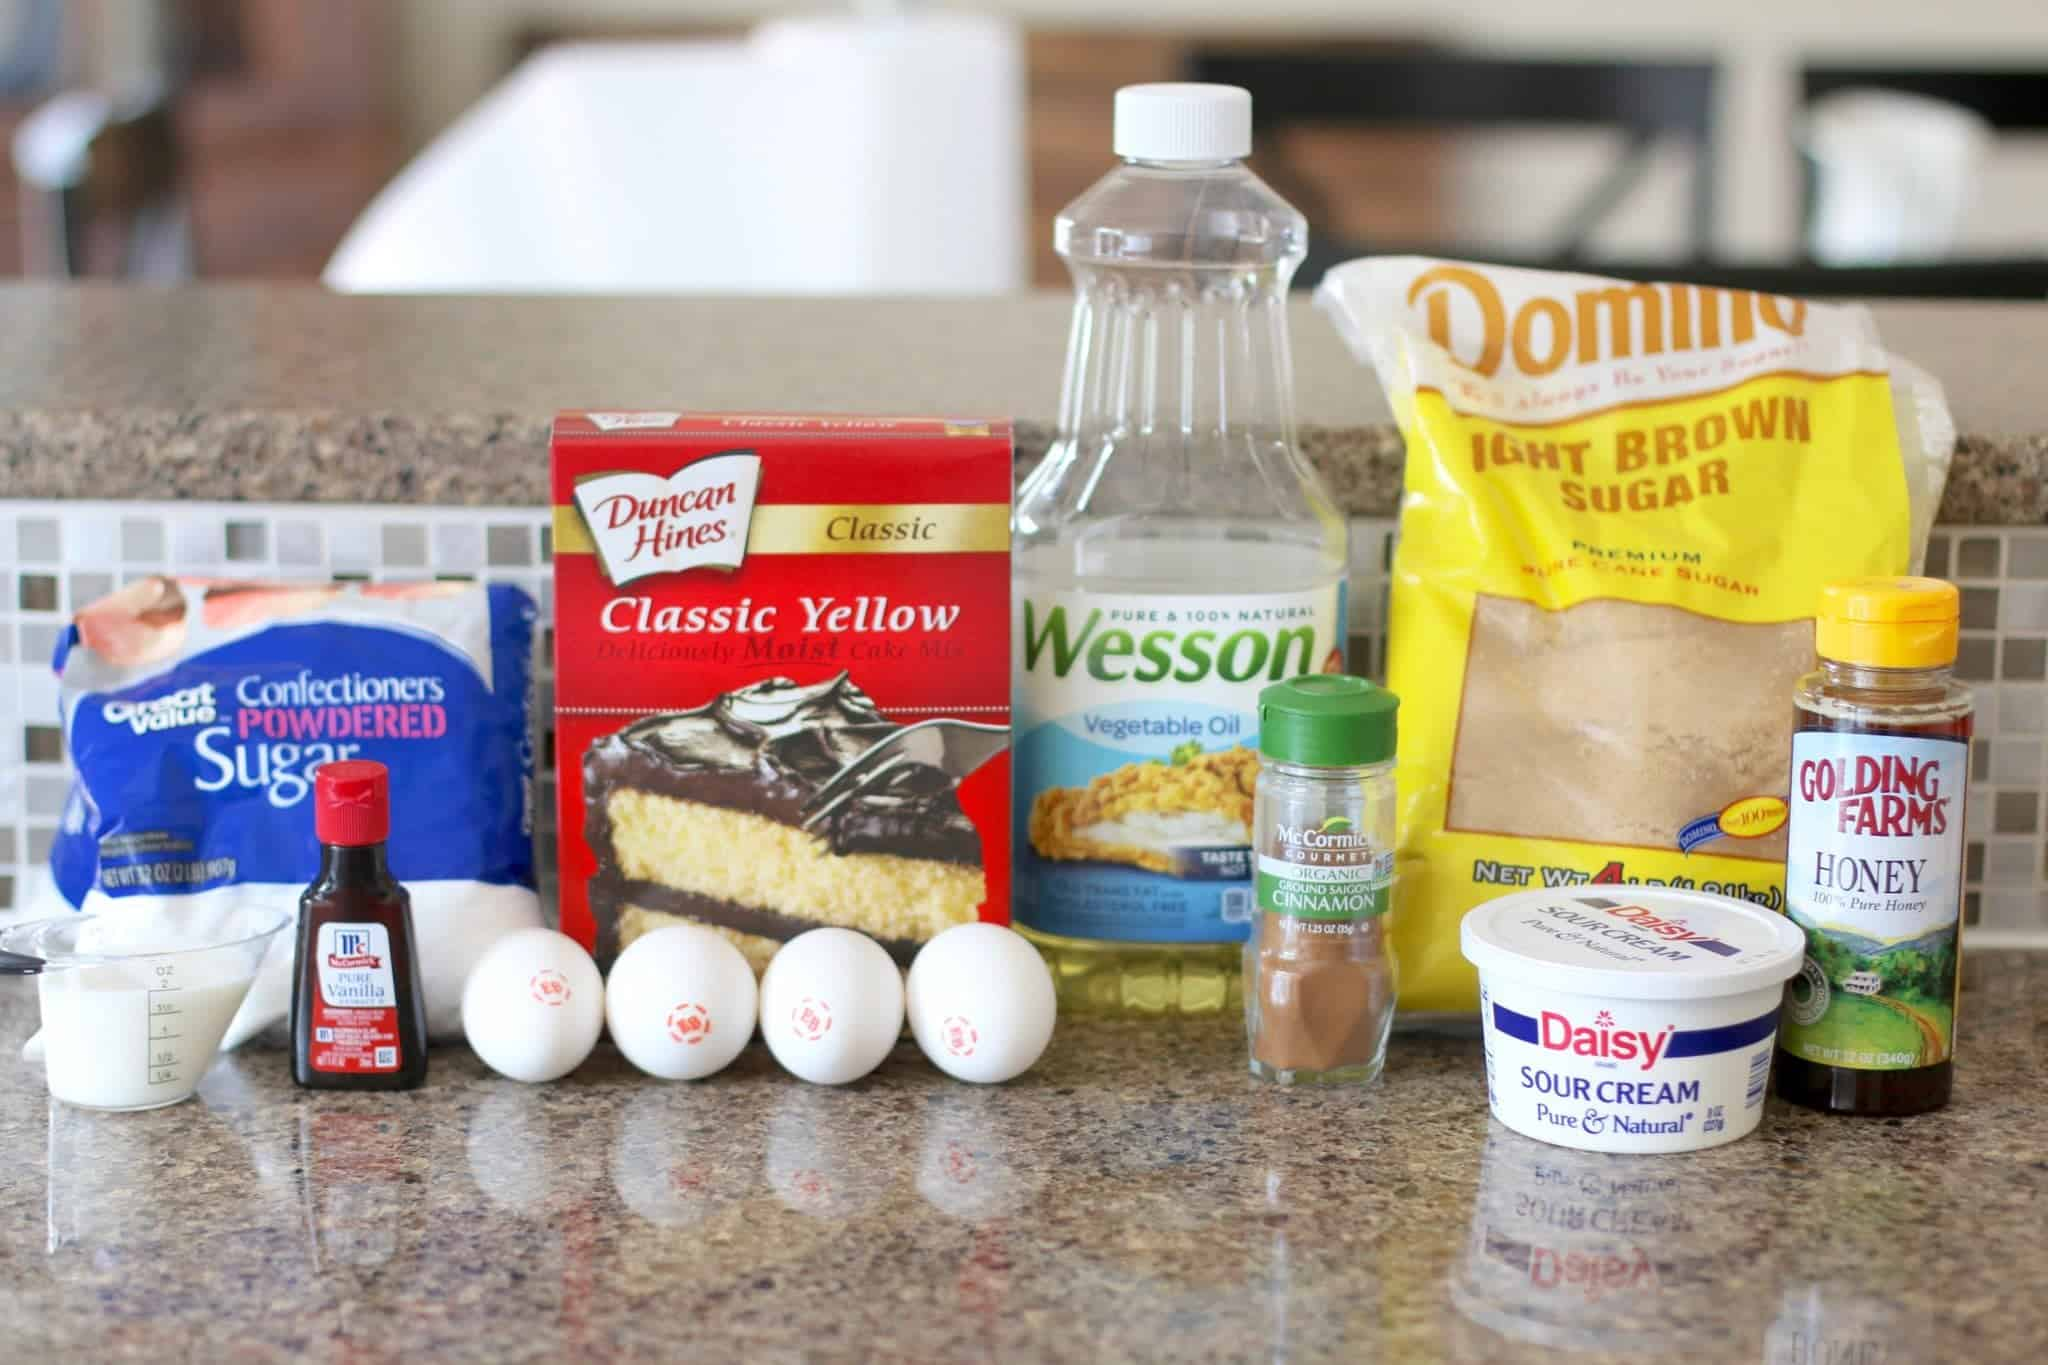 yellow cake mix, brown sugar, eggs, sour cream, oil, honey, cinnamon, vanilla extract, powdered sugar.